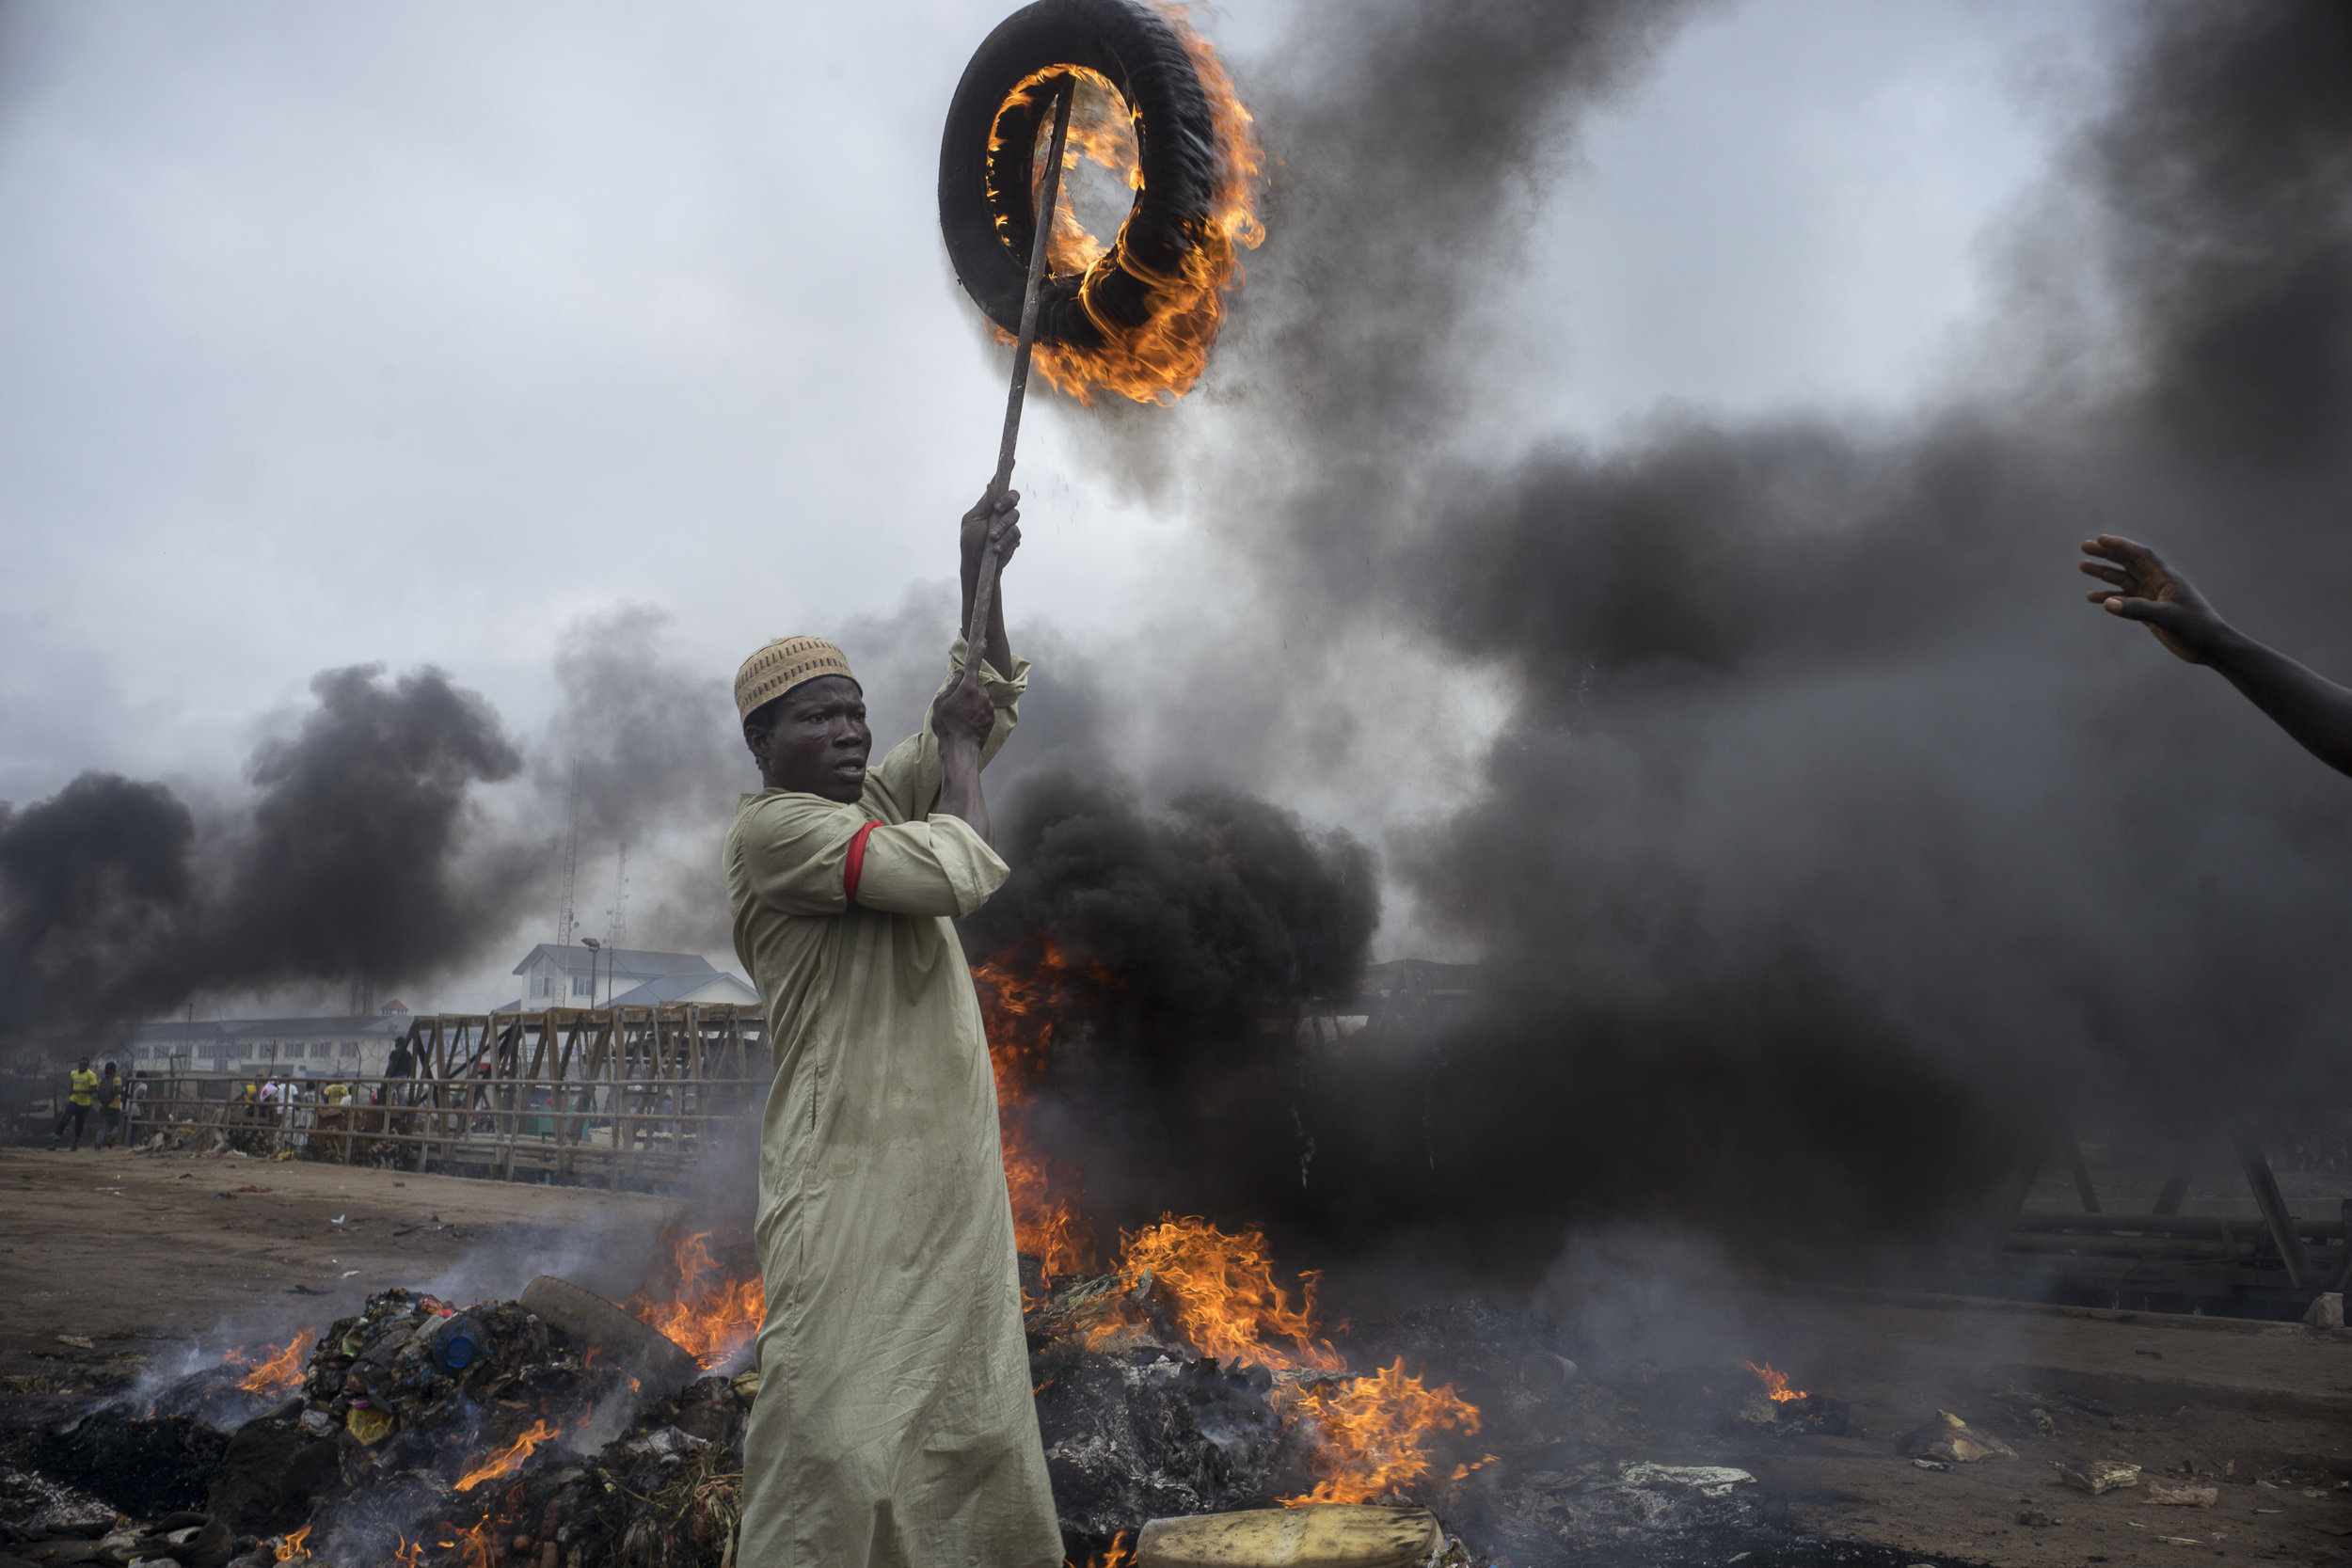 Photojournalism: Agbogbloshie